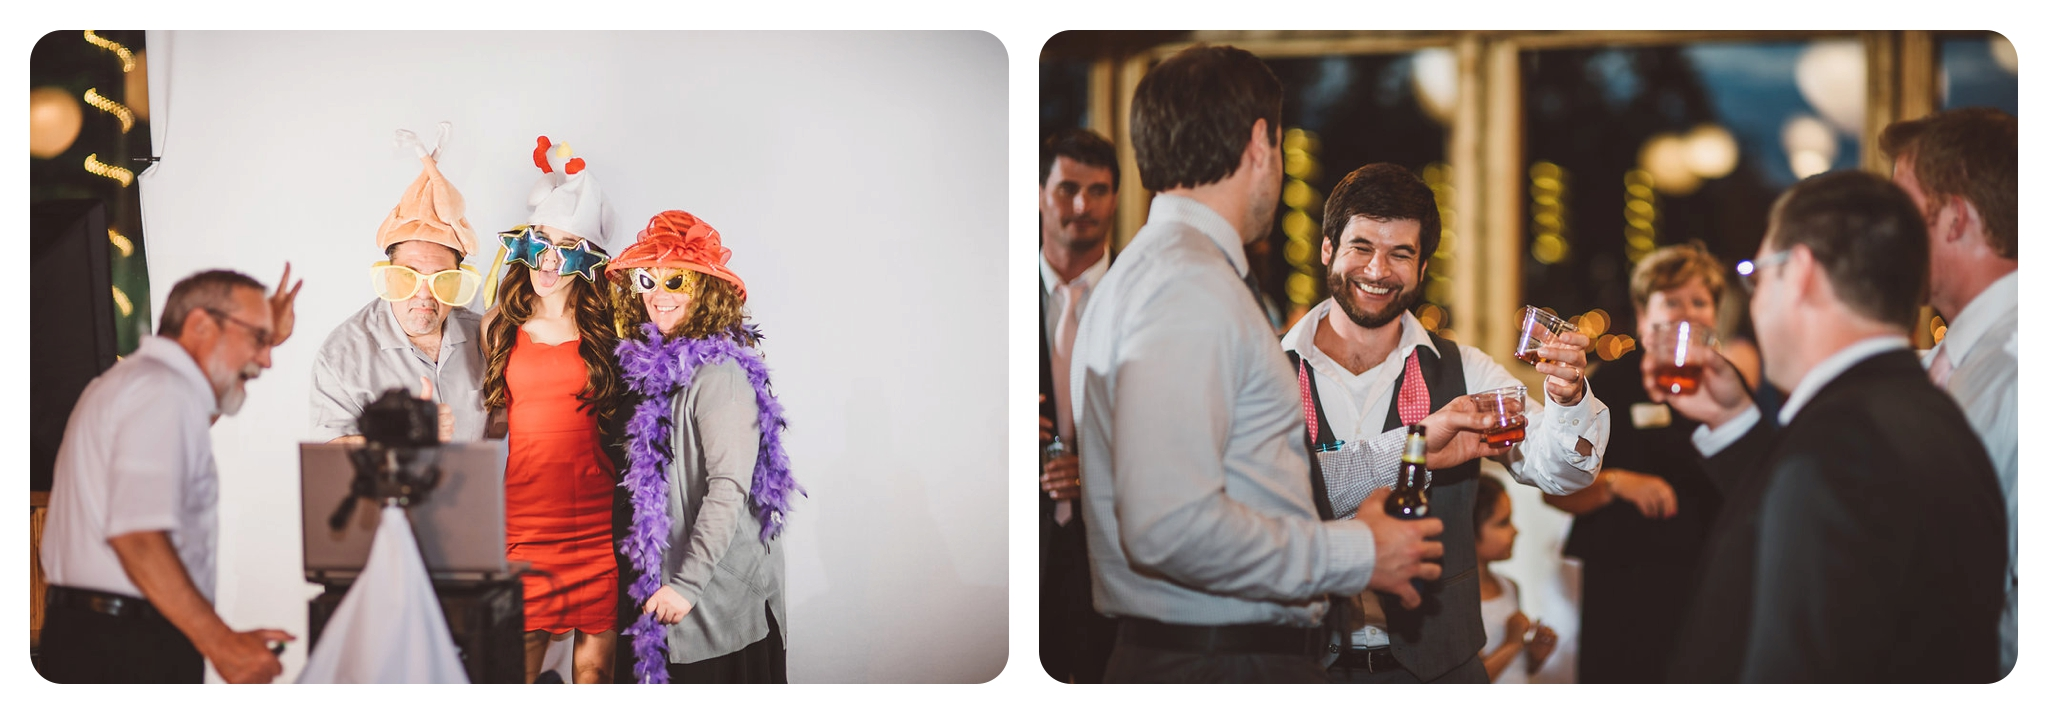 Braeloch-Weddings-Wedding-Photographer-Pat-Cori-Photography-043.jpg